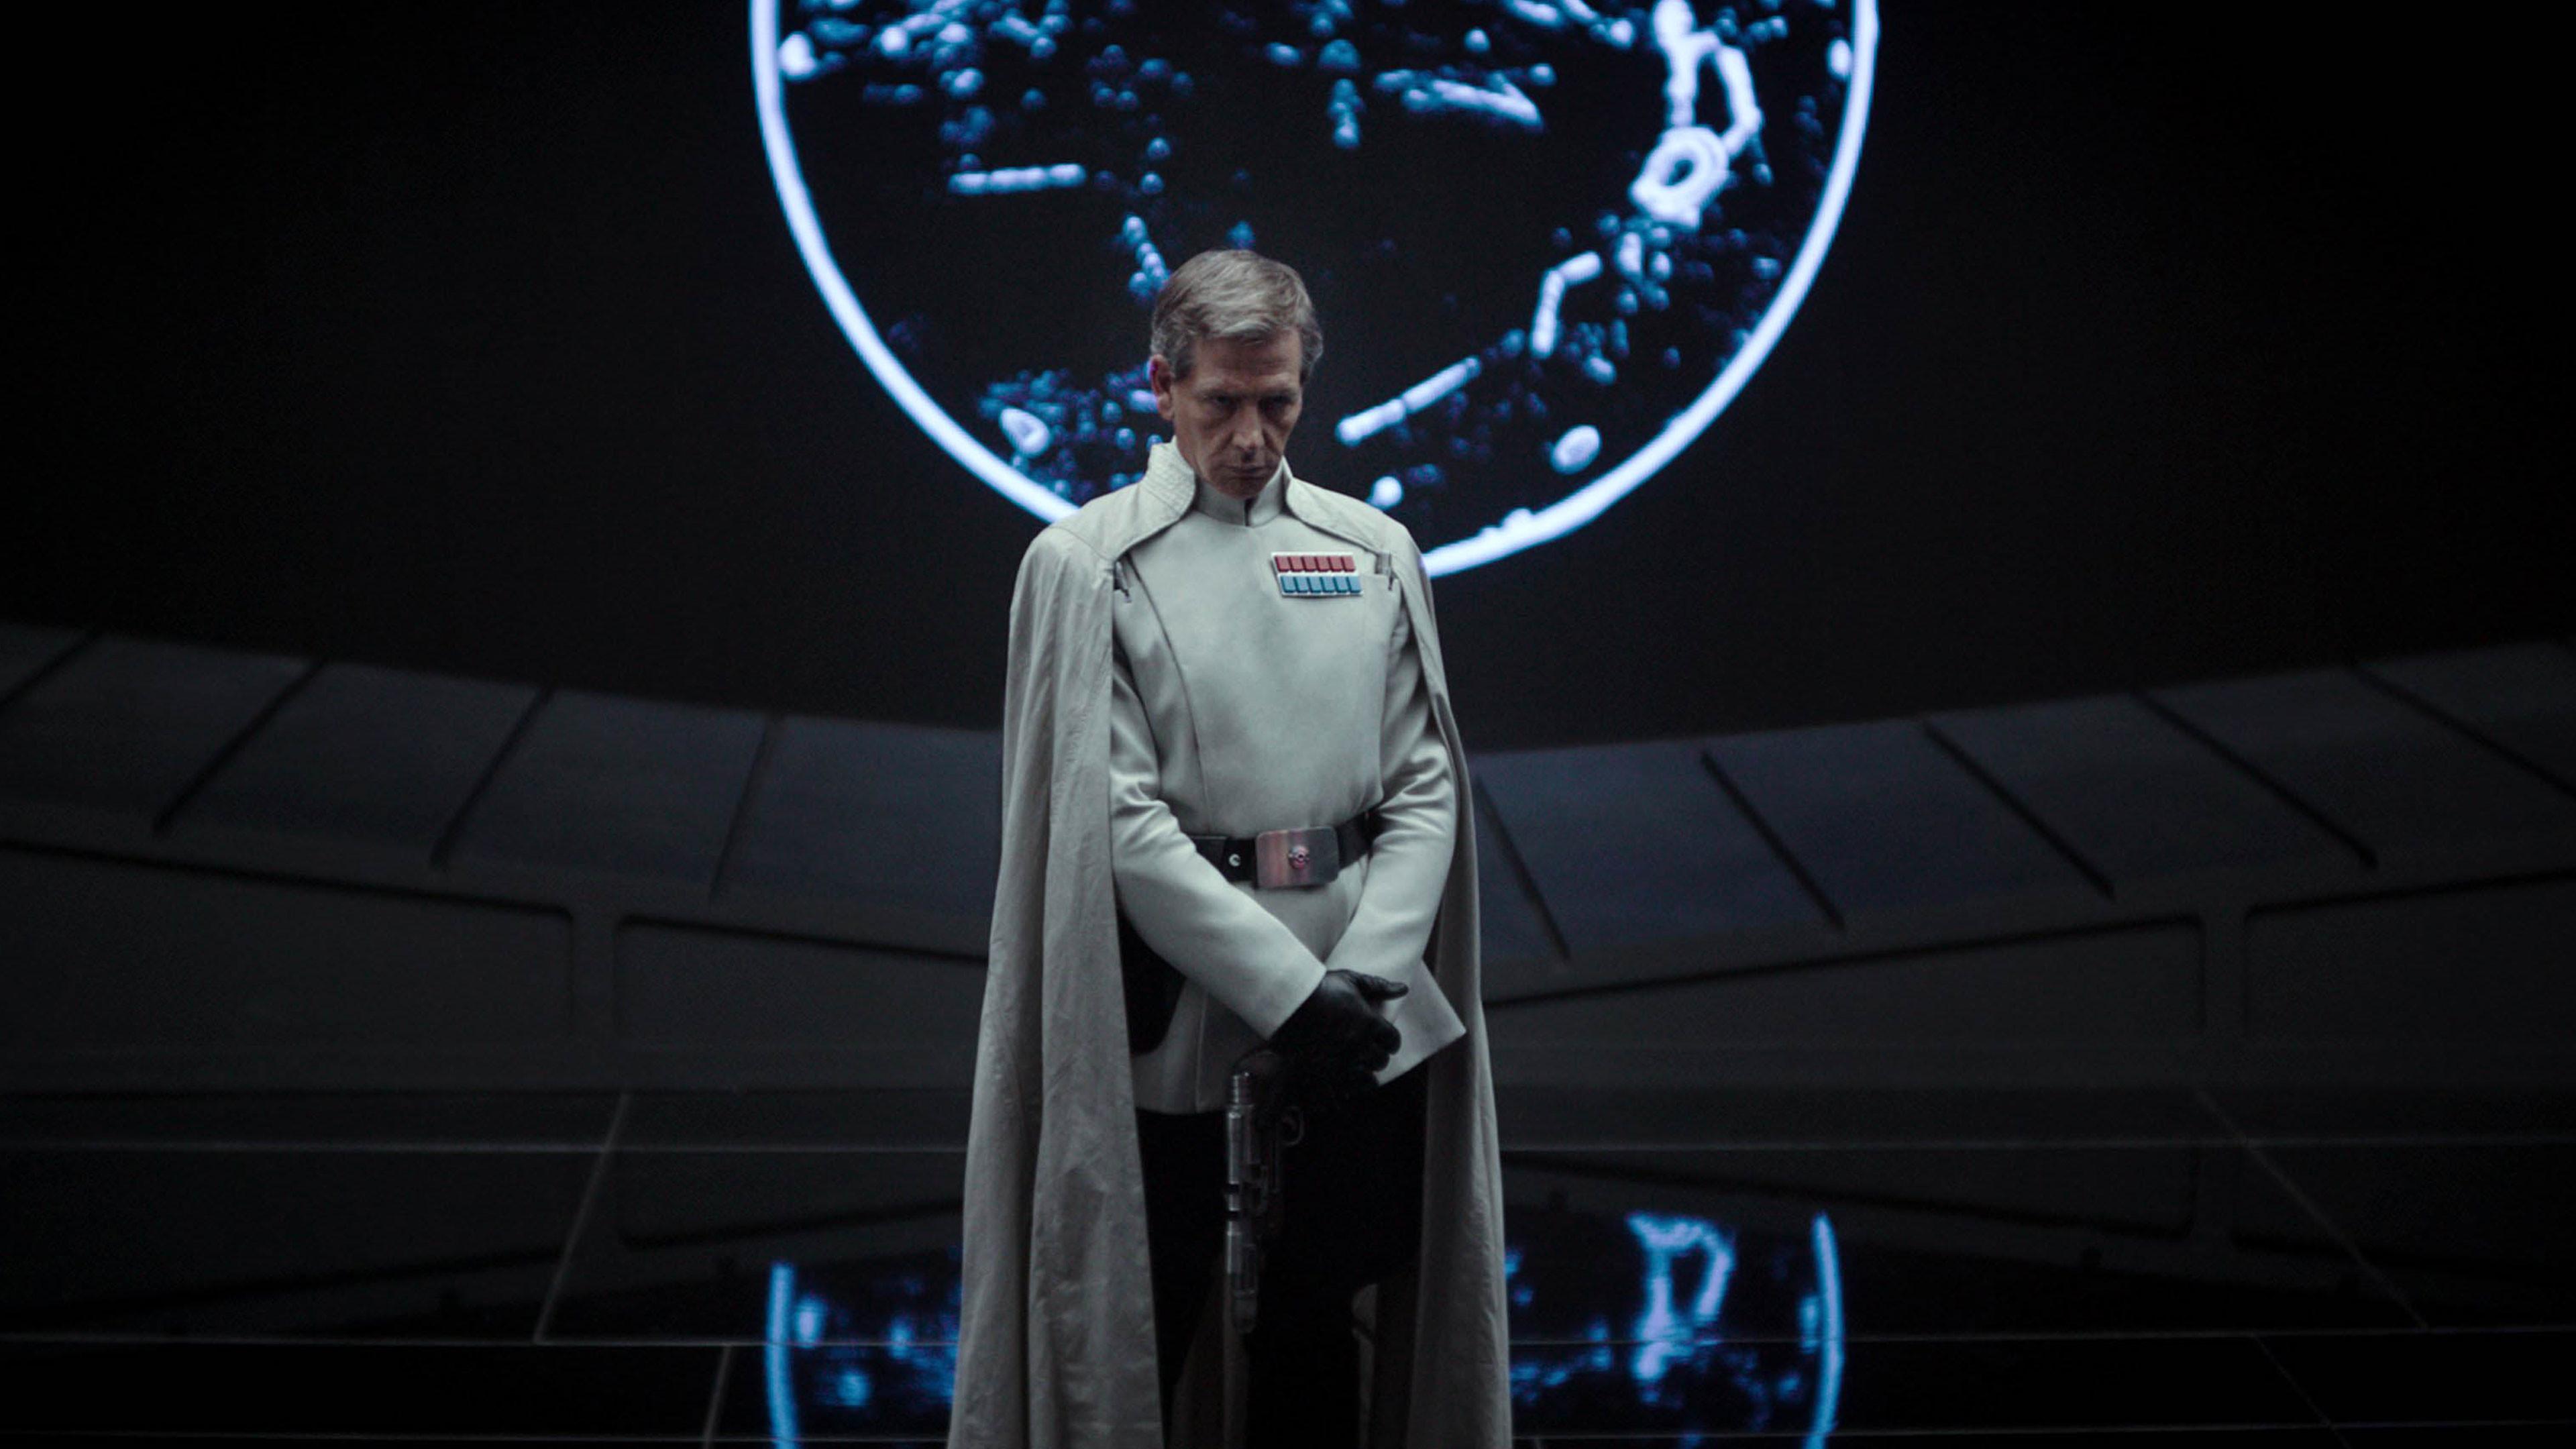 Star Wars Rogue One – Ben Mendelsohn as Orson Krennic wallpaper